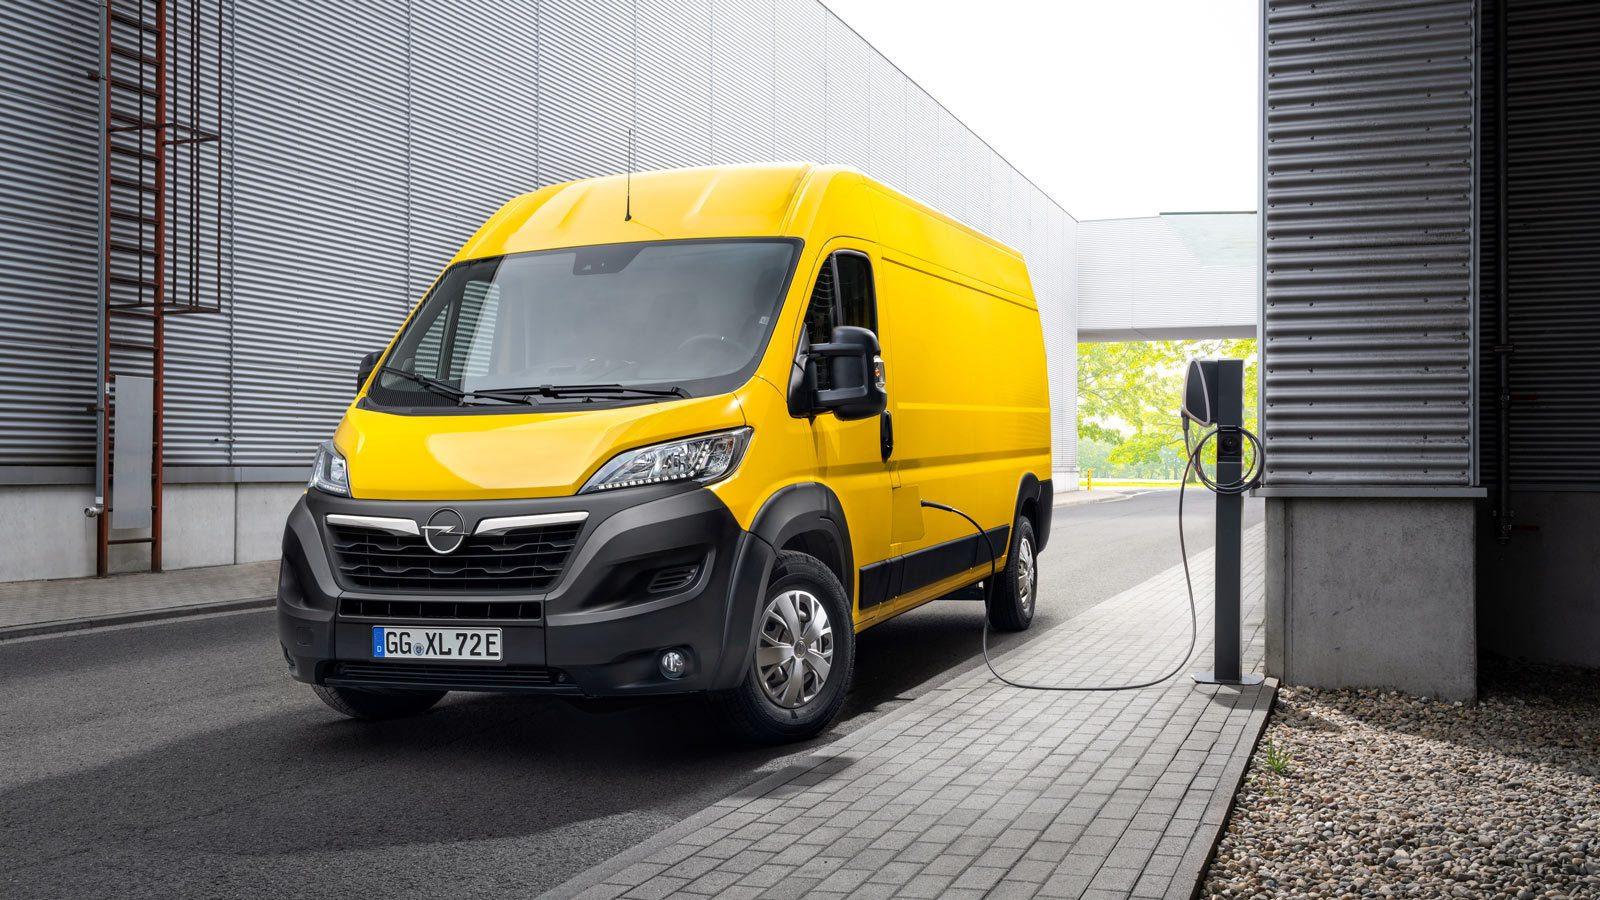 Nowy Opel Movano-e elektryczny